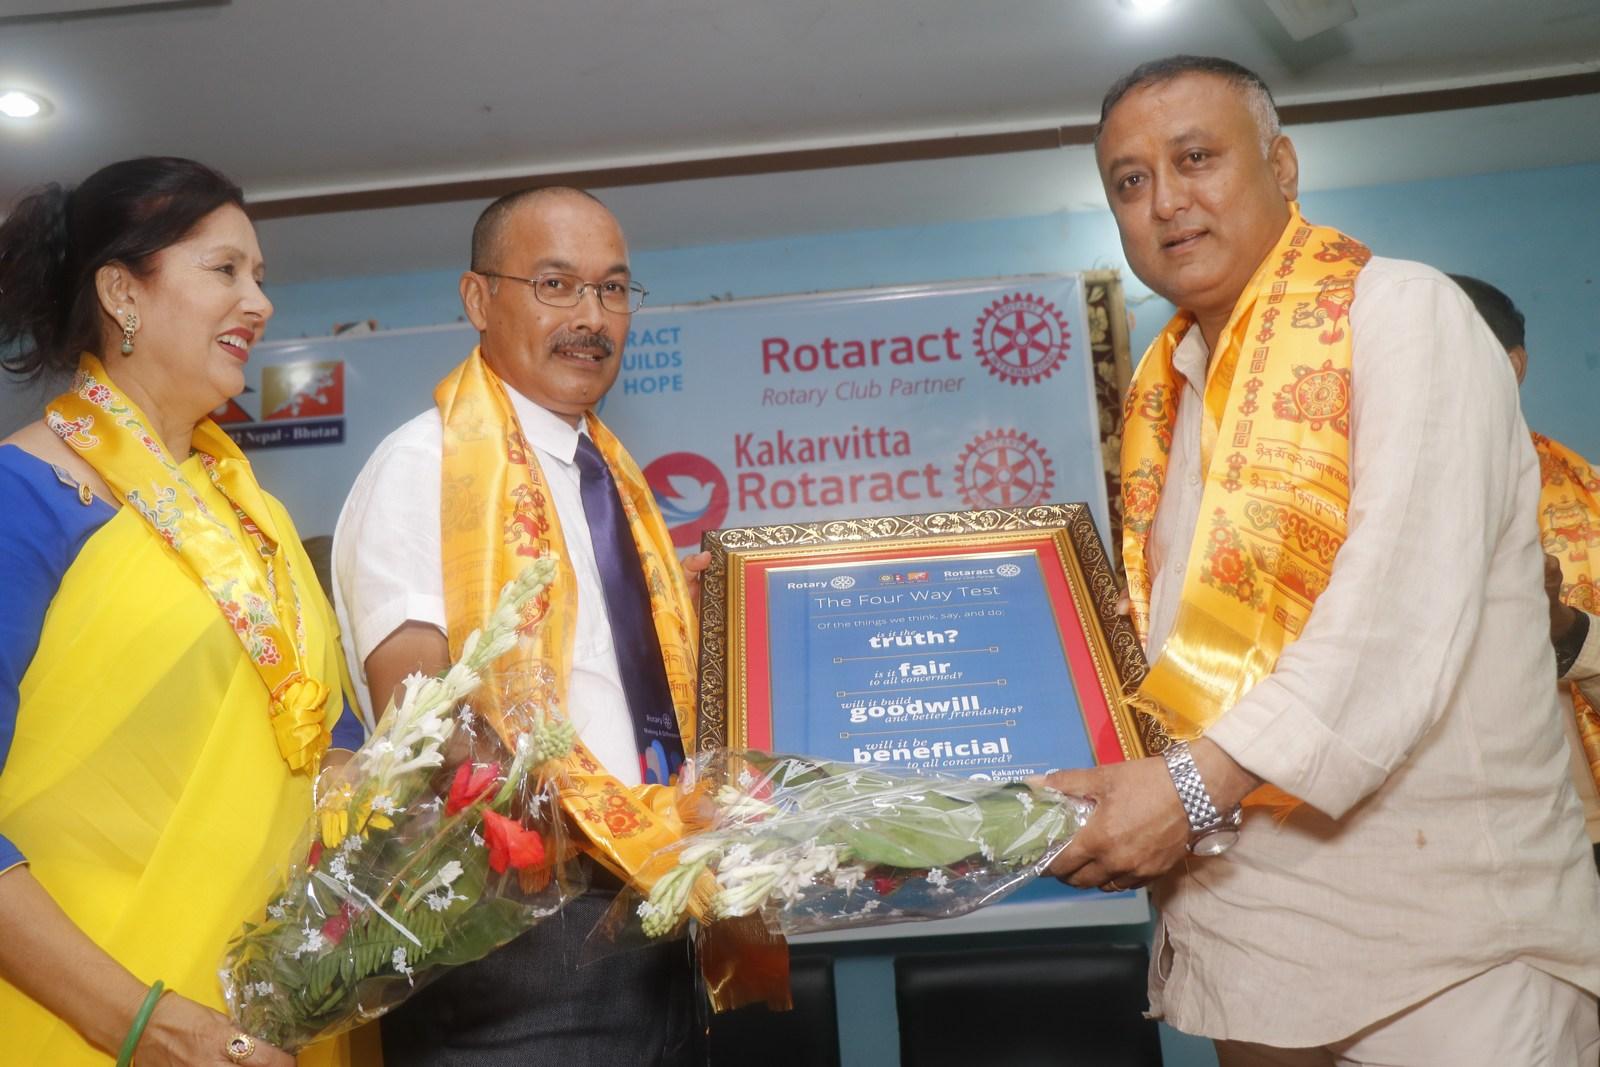 8th-Installation-Ceremony-Rotary-Club-of-Kakarvitta-92